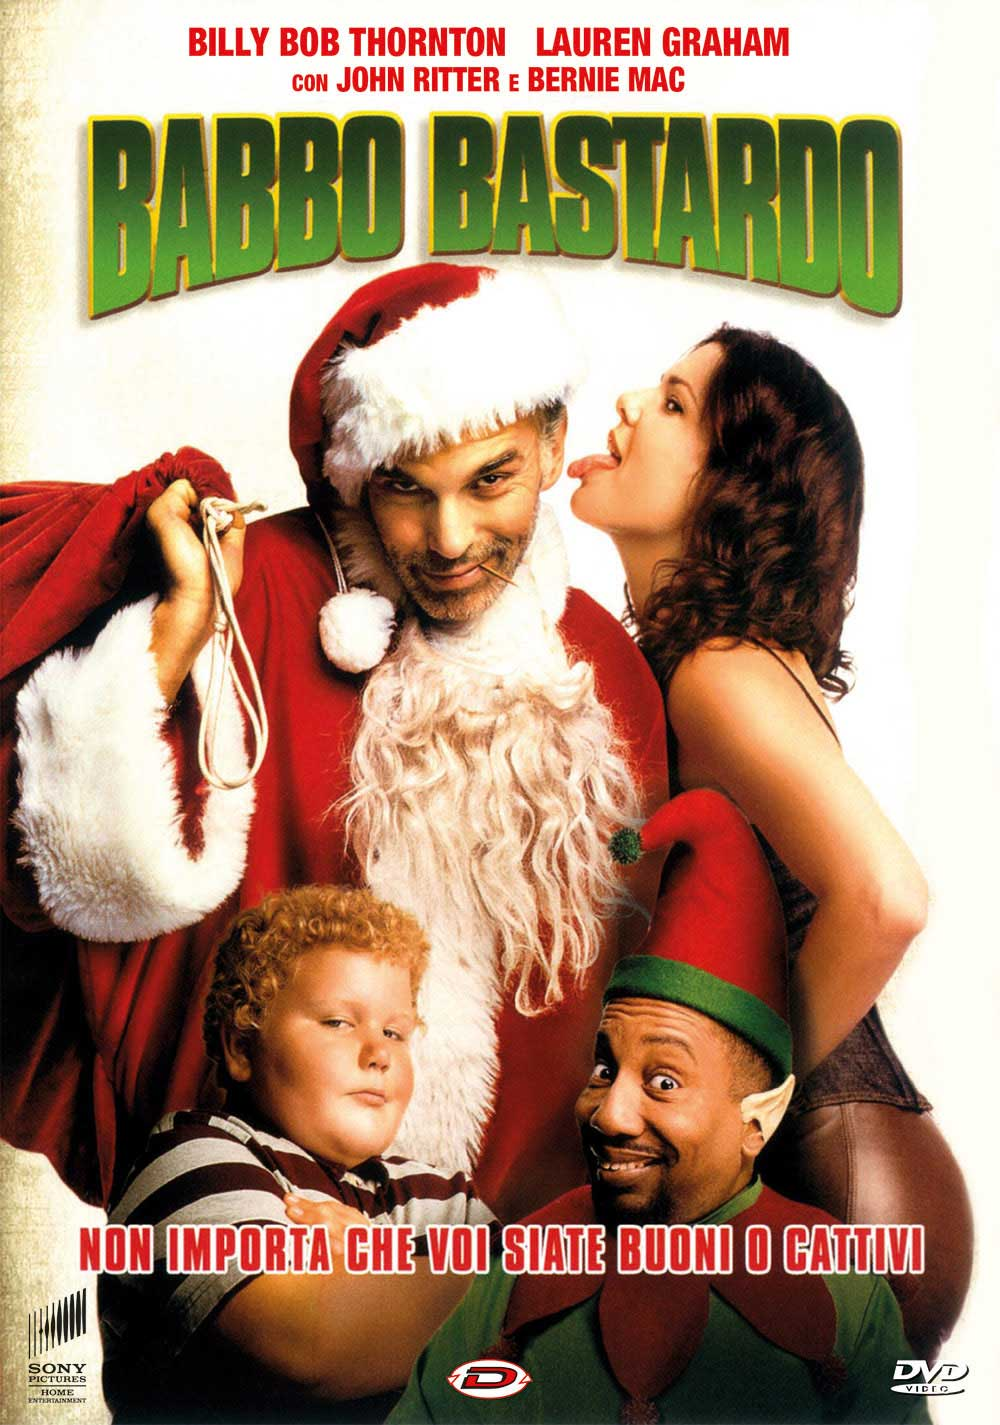 BABBO BASTARDO (DVD)